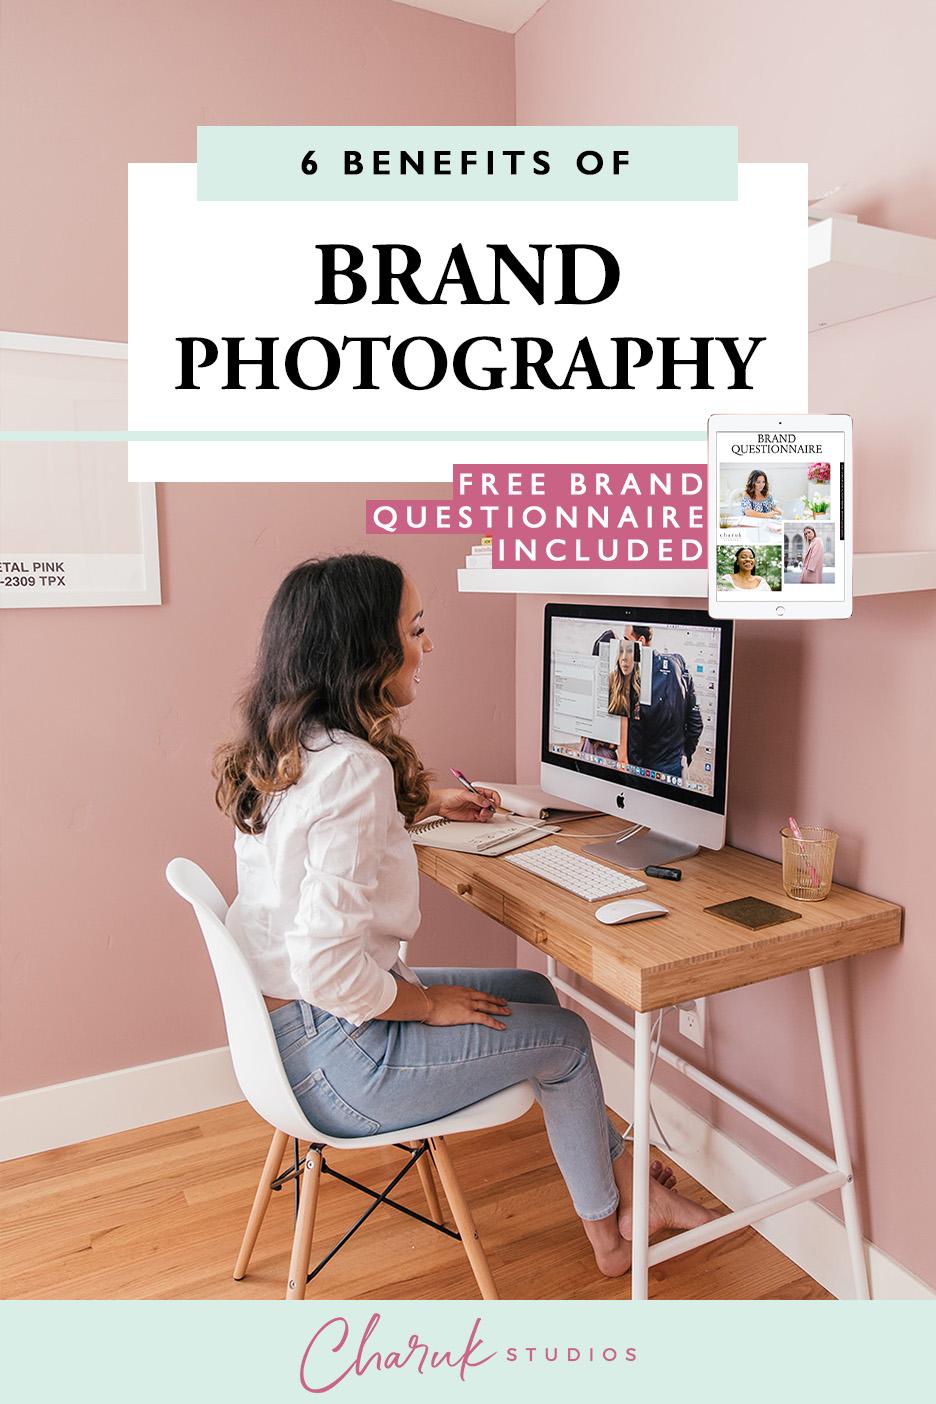 6 Benefits of brand photography.jpg